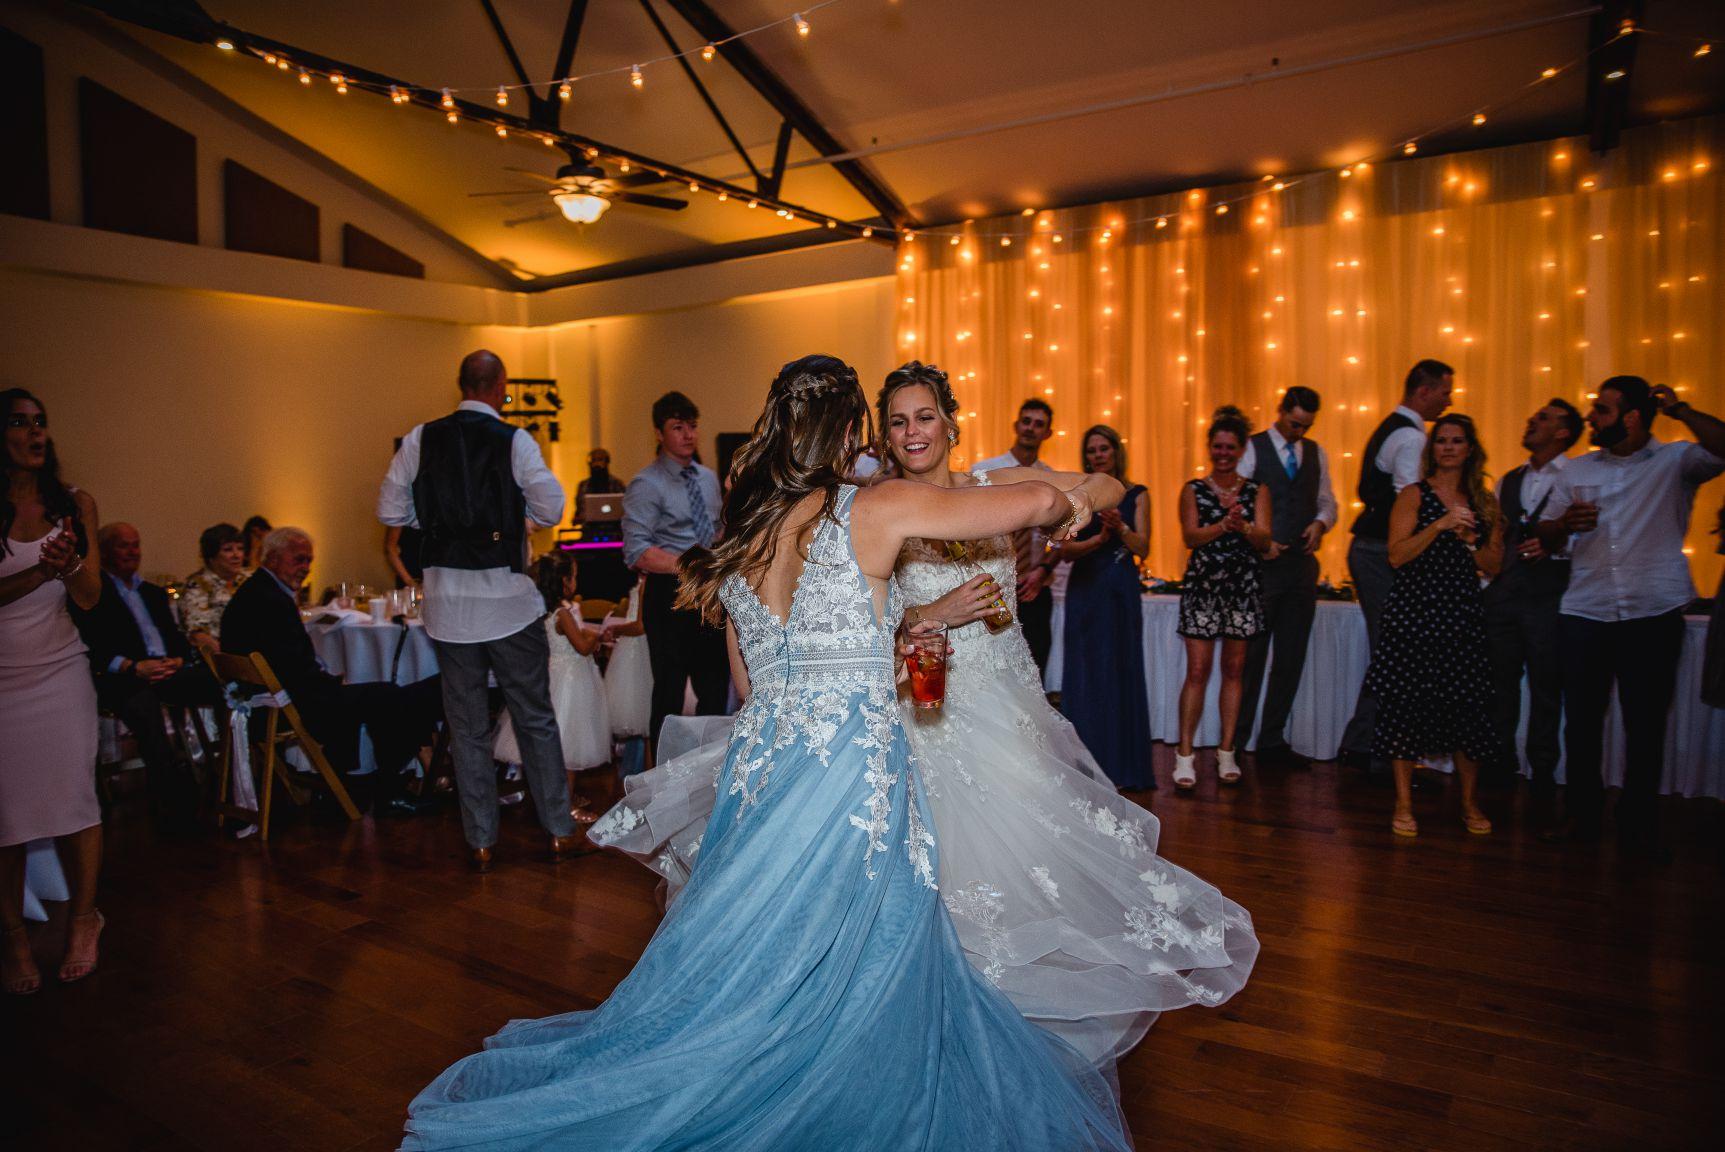 reception hall banquet room dancing